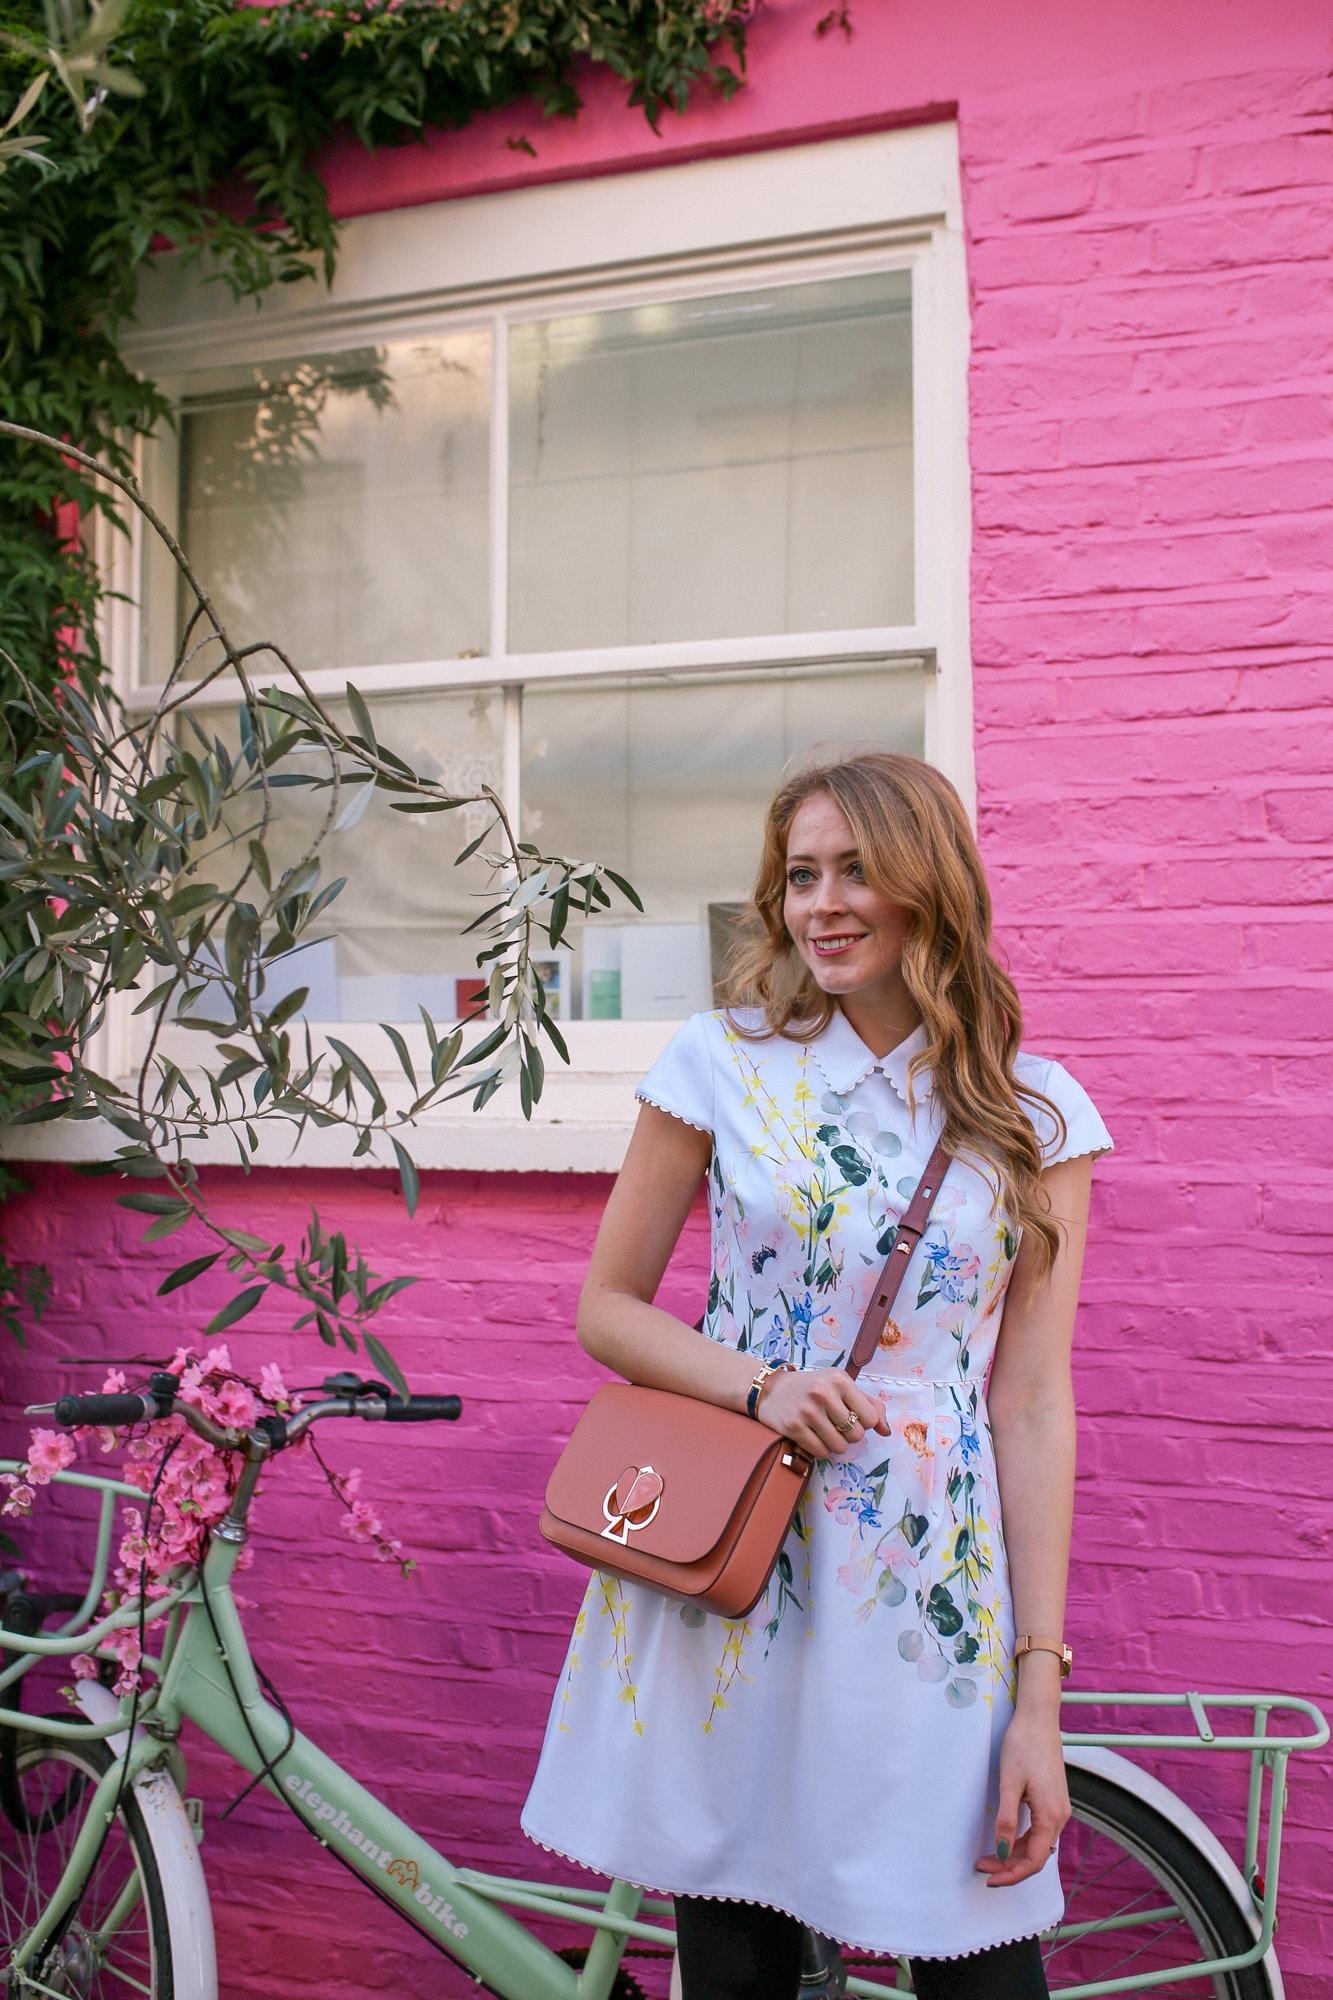 Kate Spade Nikola Bag, Ted Baker Dress in Notting Hill, London